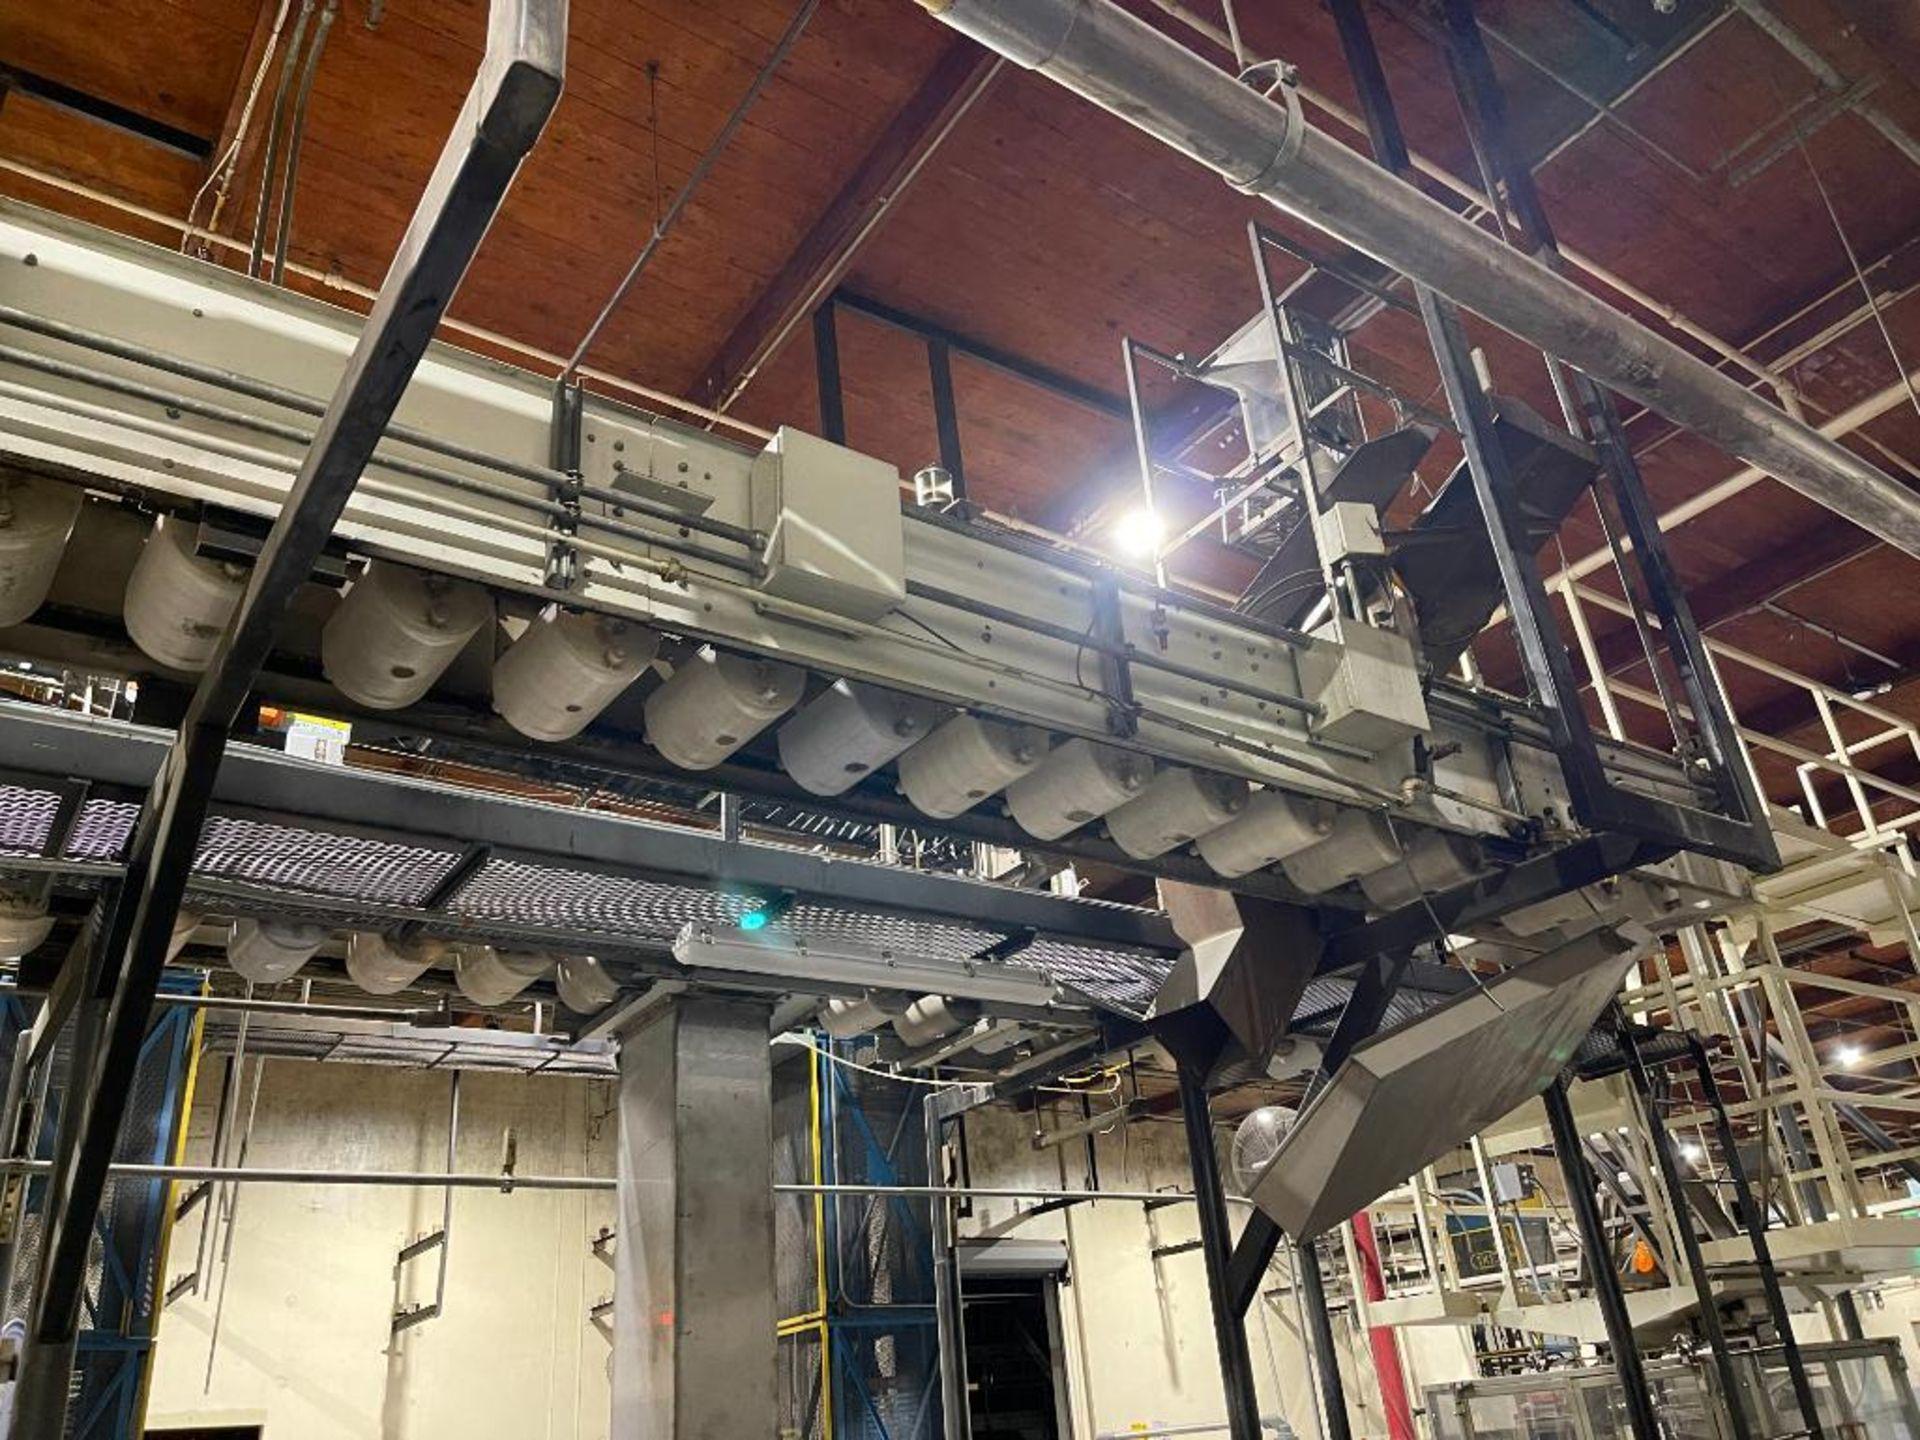 Meyer horizontal bucket elevator, model PC-072-12-BCC - Image 10 of 18